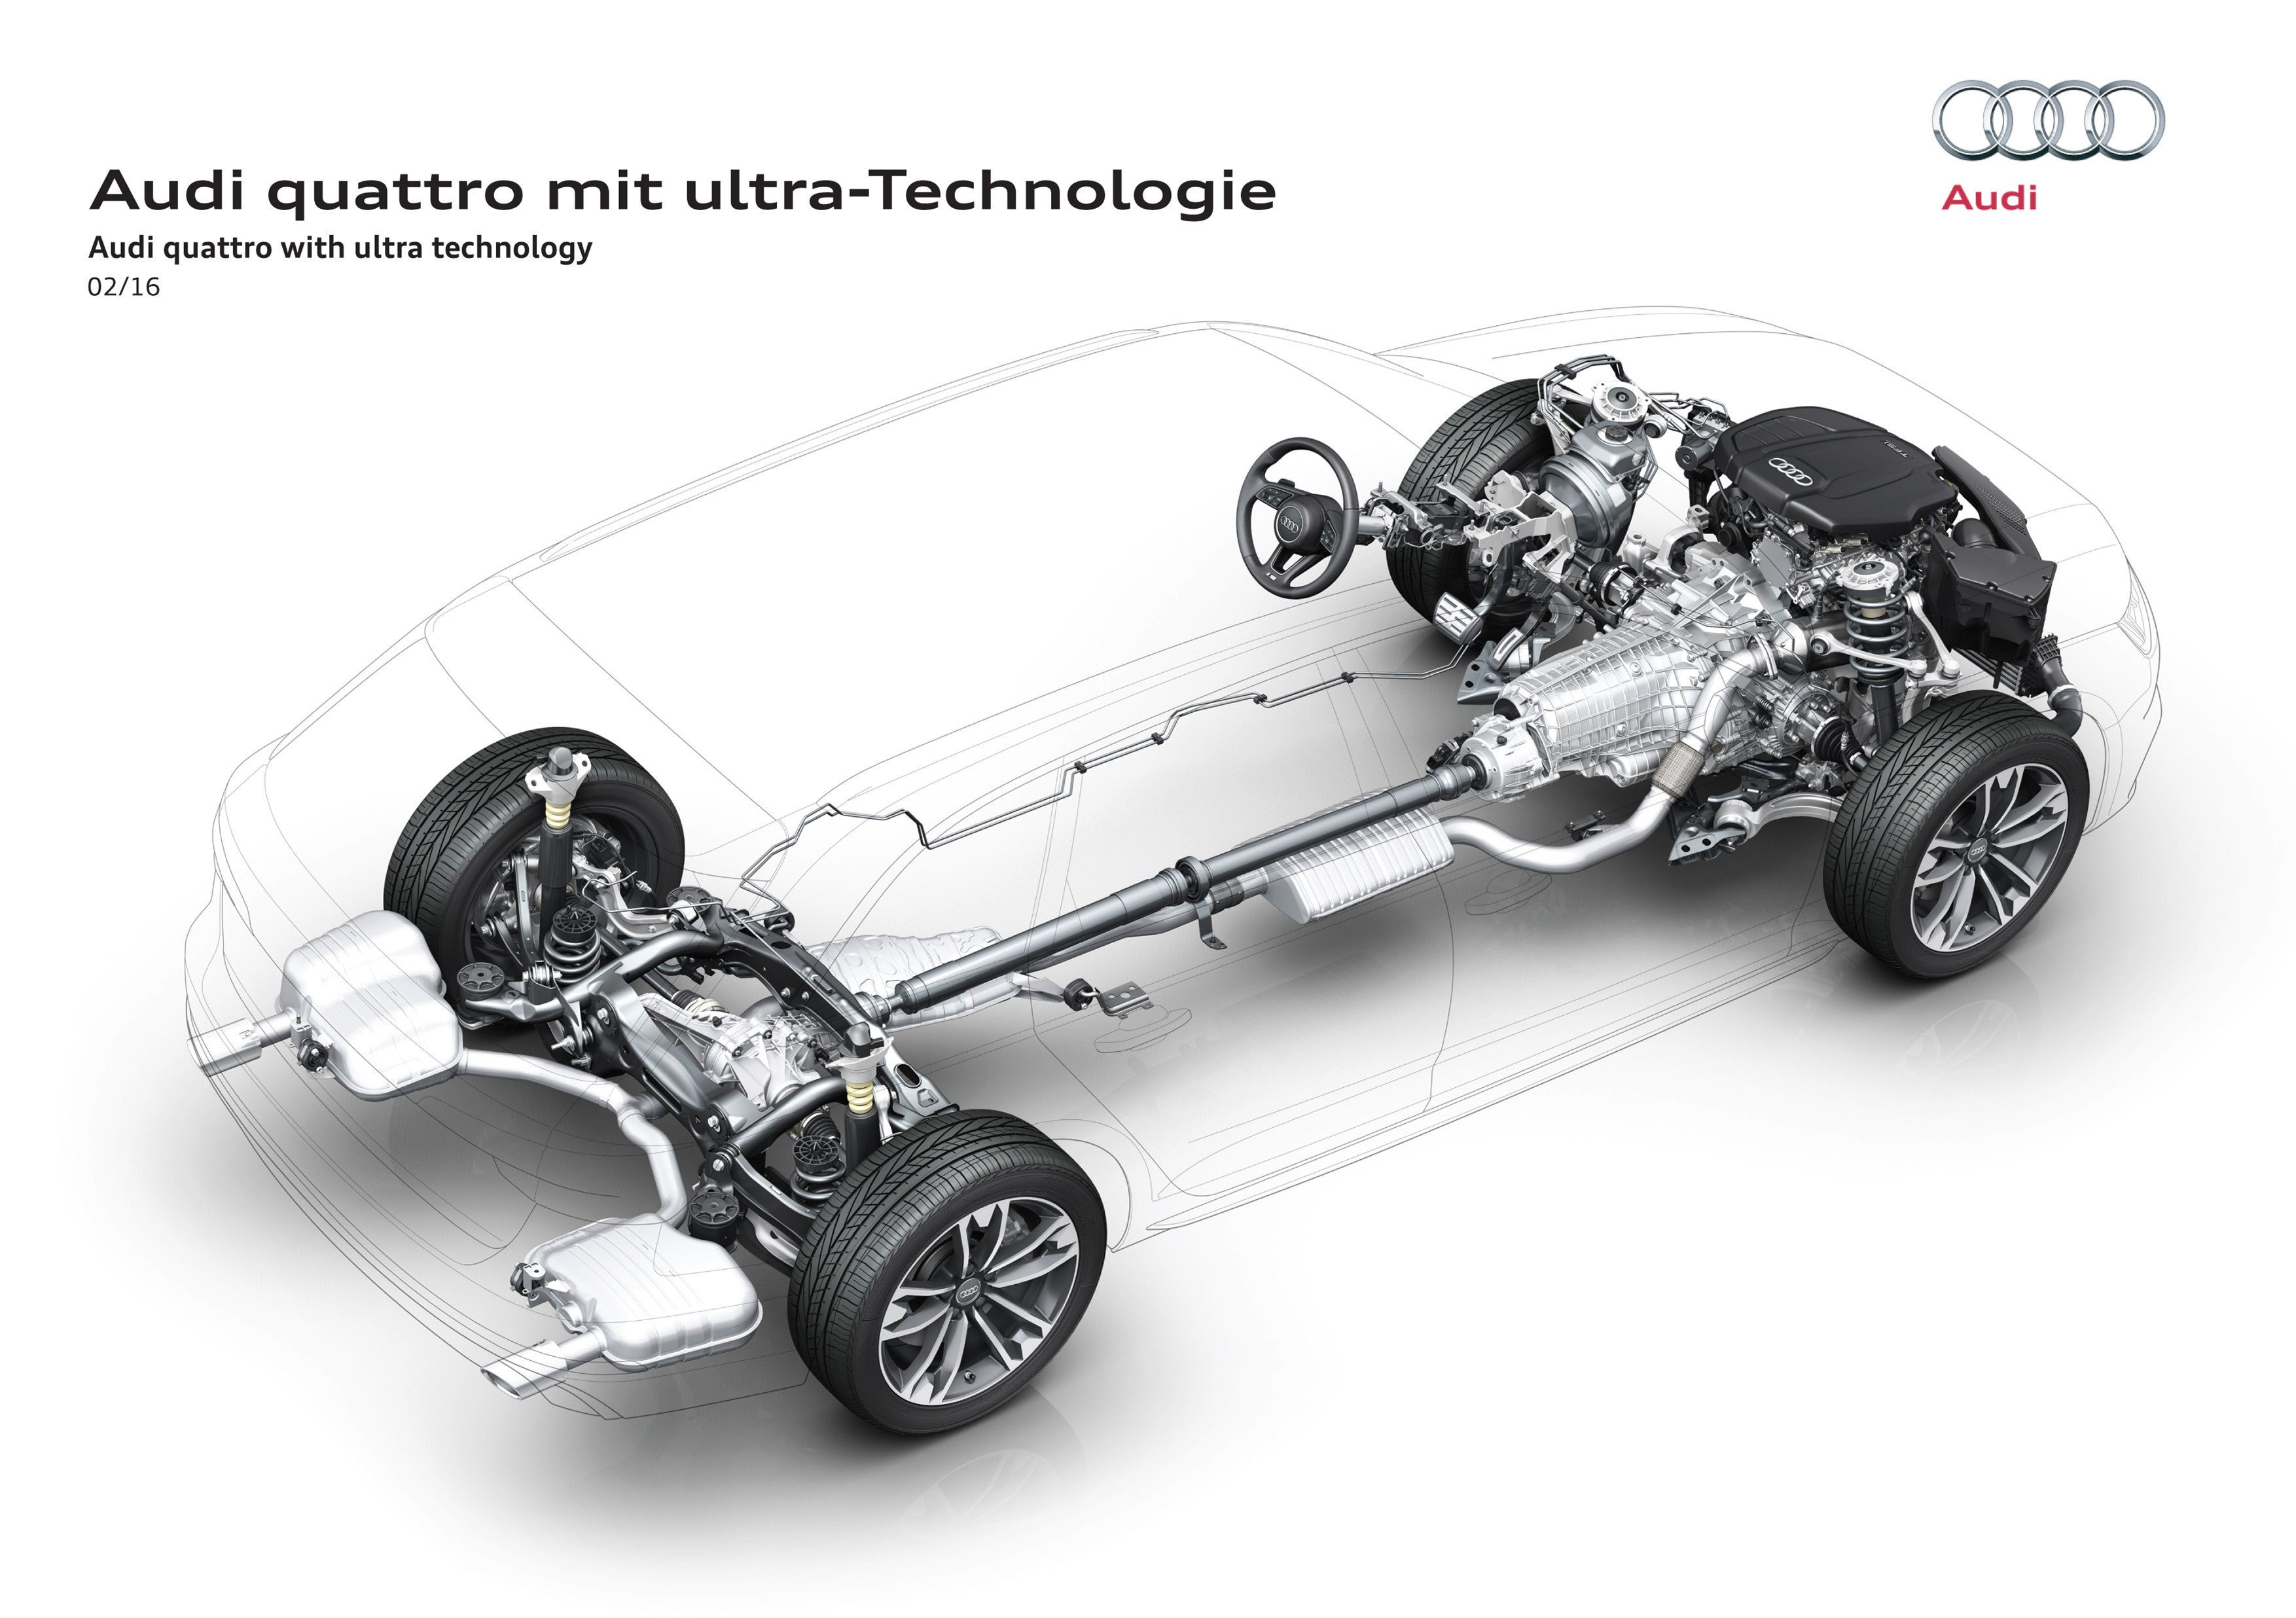 audi s high tech new quattro is about to piss off its biggest fans rh jalopnik com Audi Seats Audi Seats